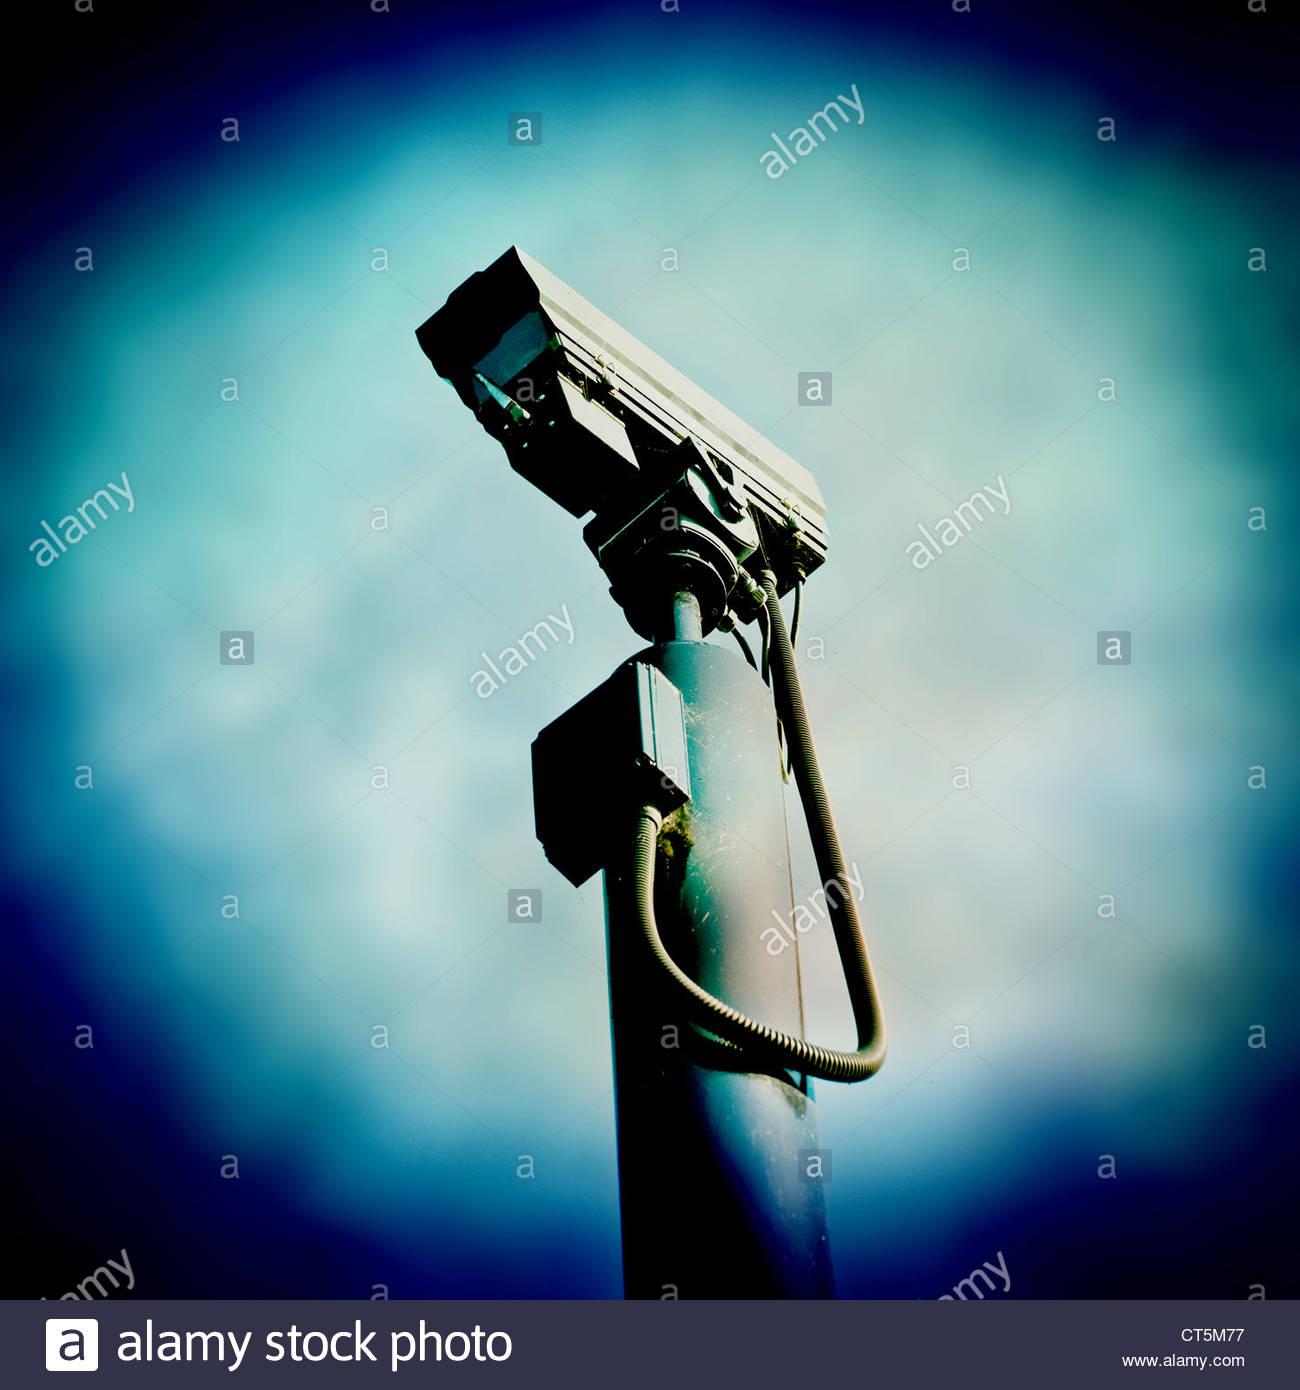 surveillance camera - Stock Image